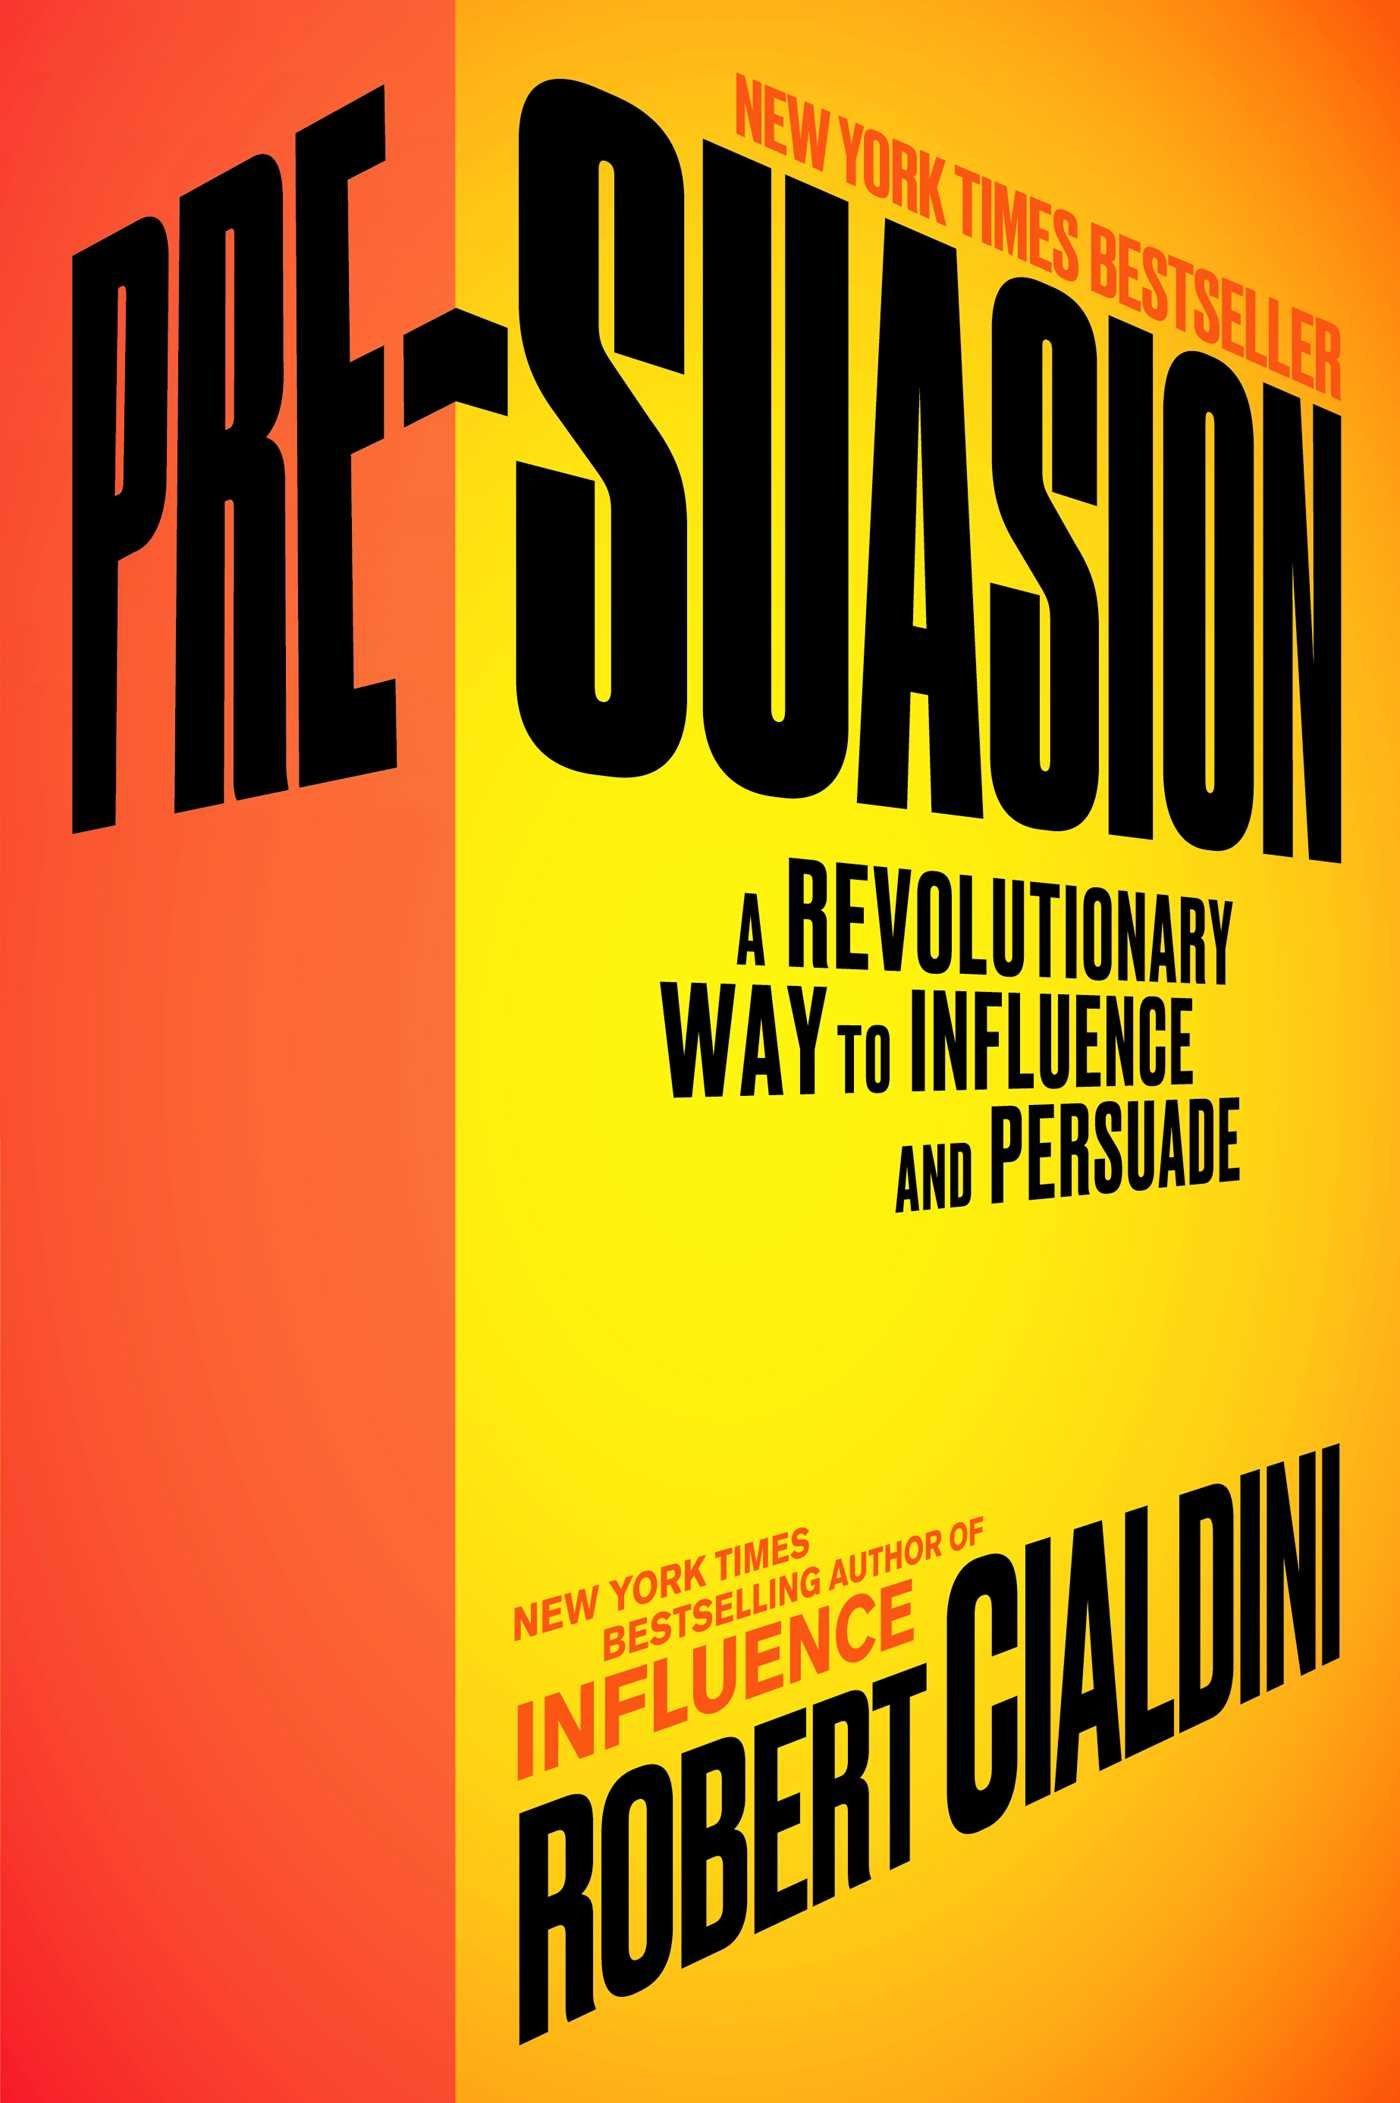 pre suasion a revolutionary way to influence and persuade robert